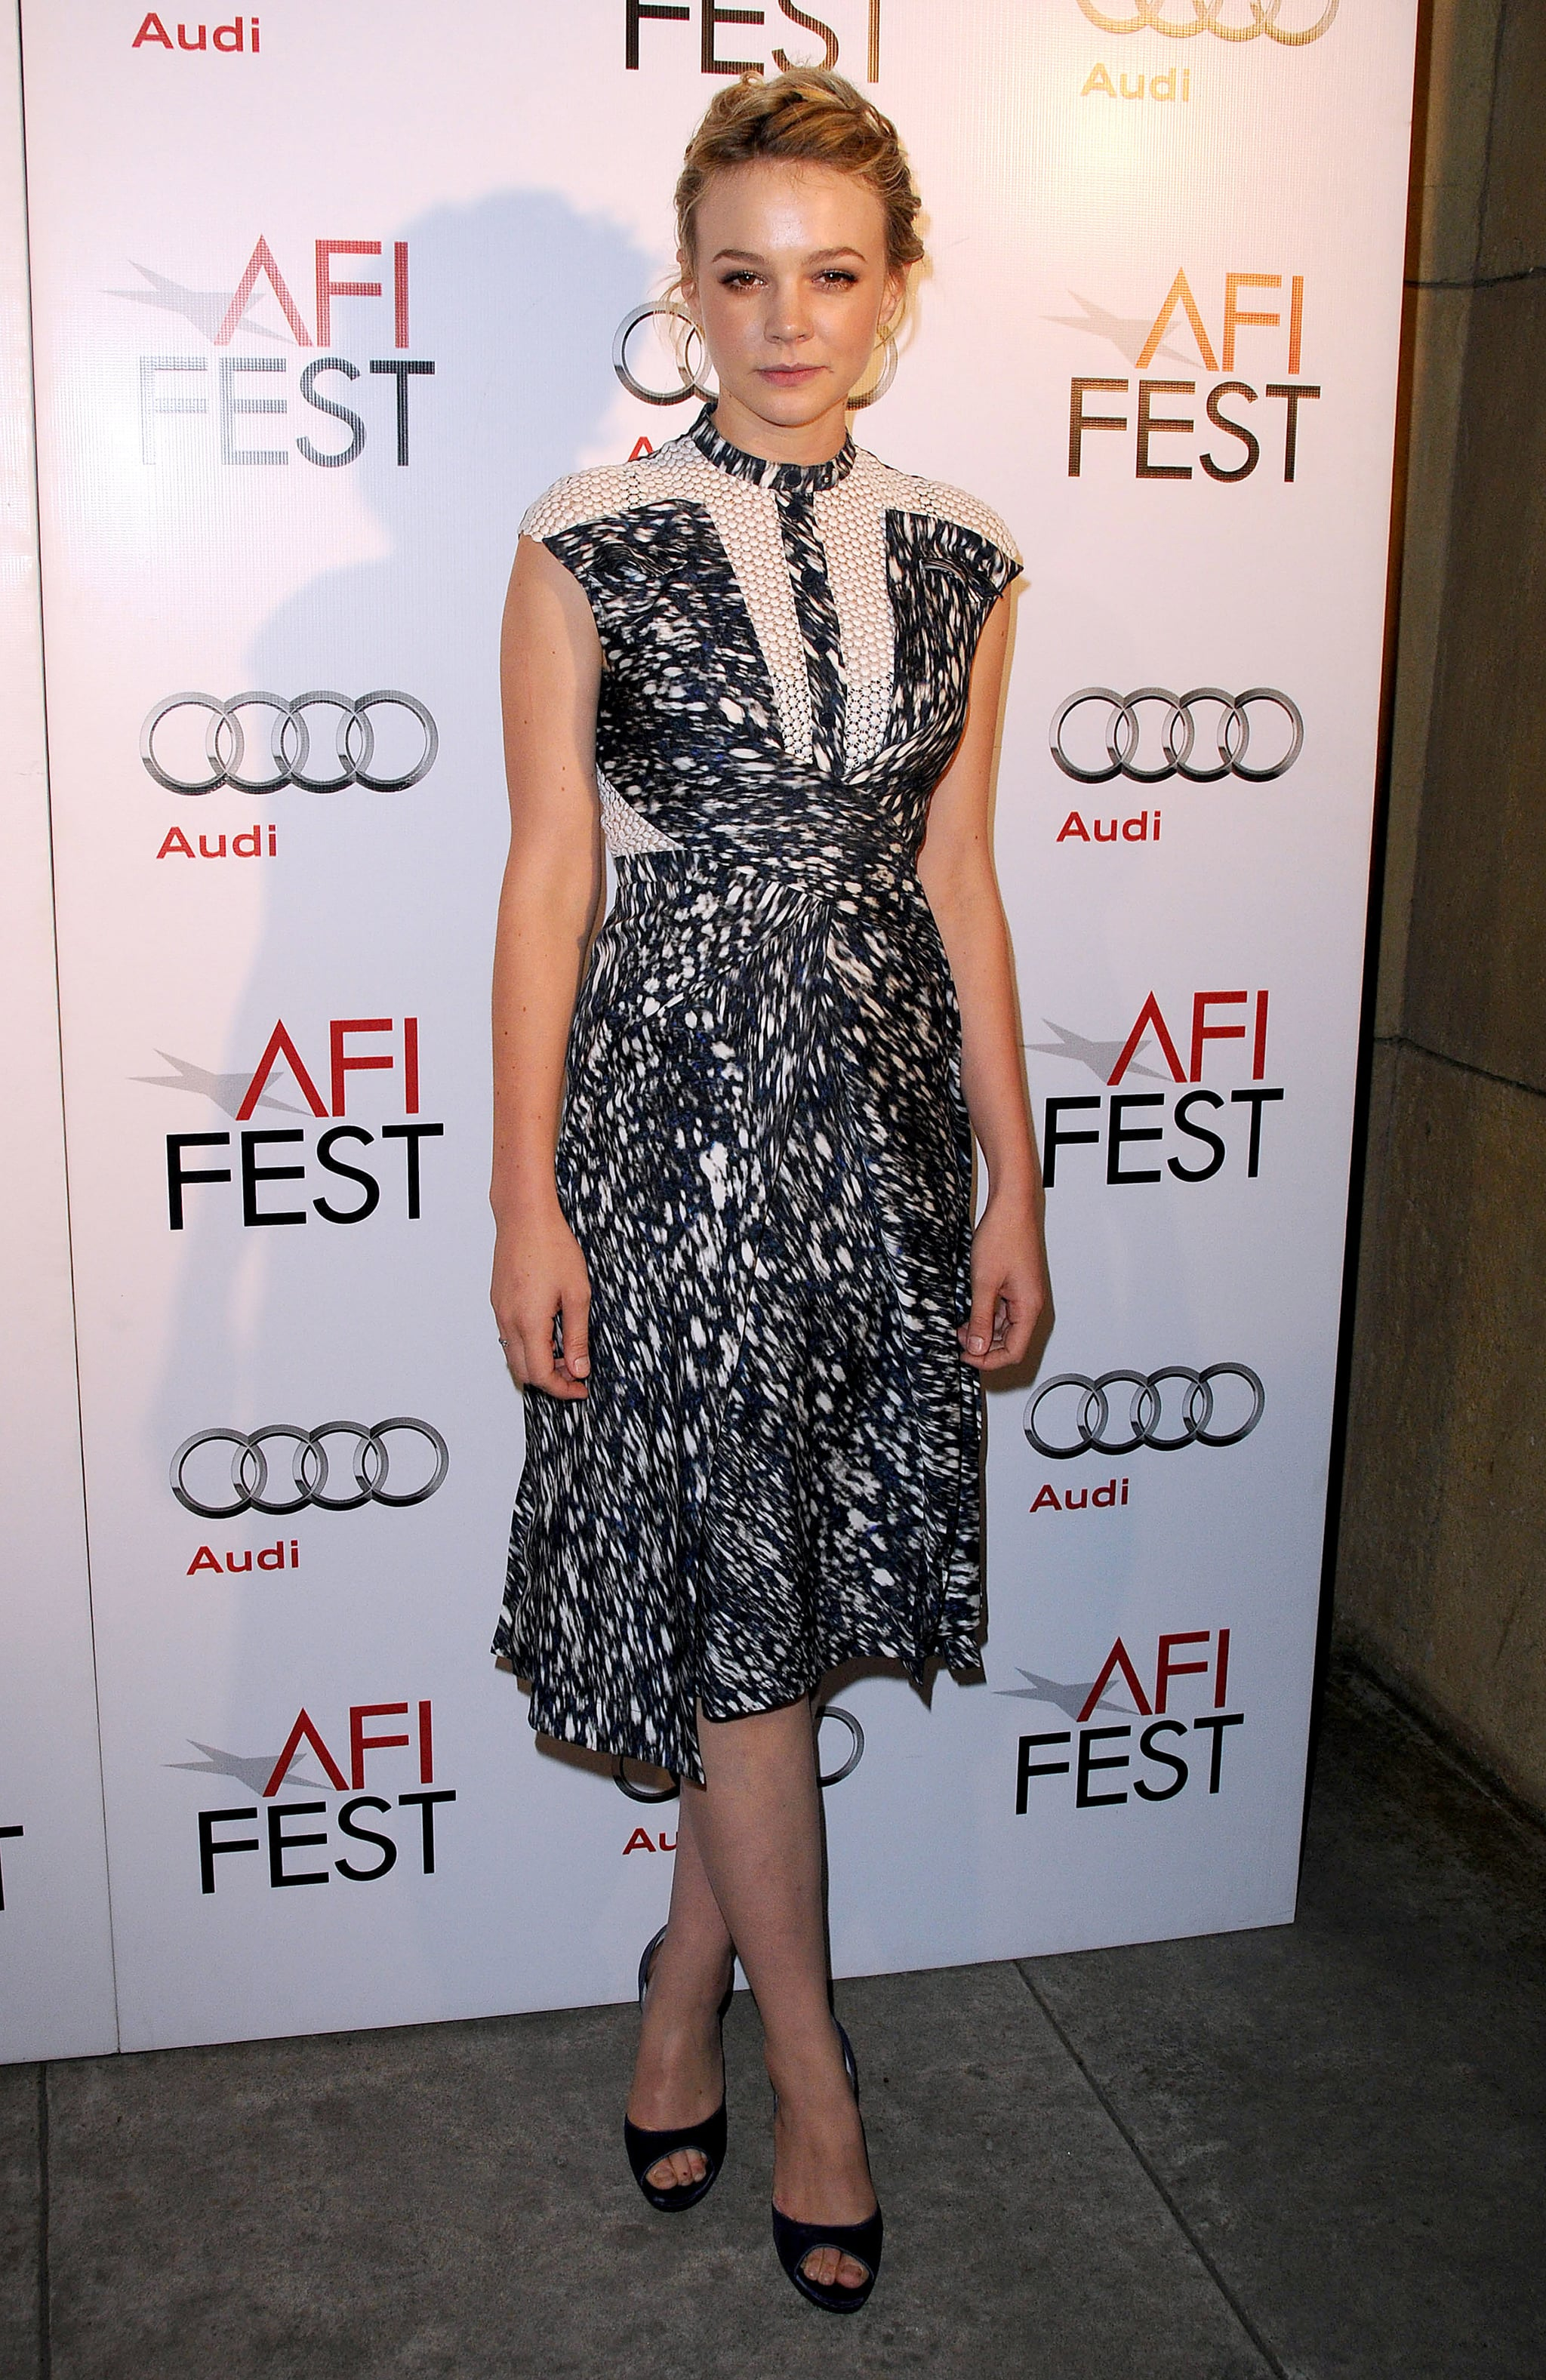 Carey Mulligan in Peter Pilotto at the 2010 AFI Fest